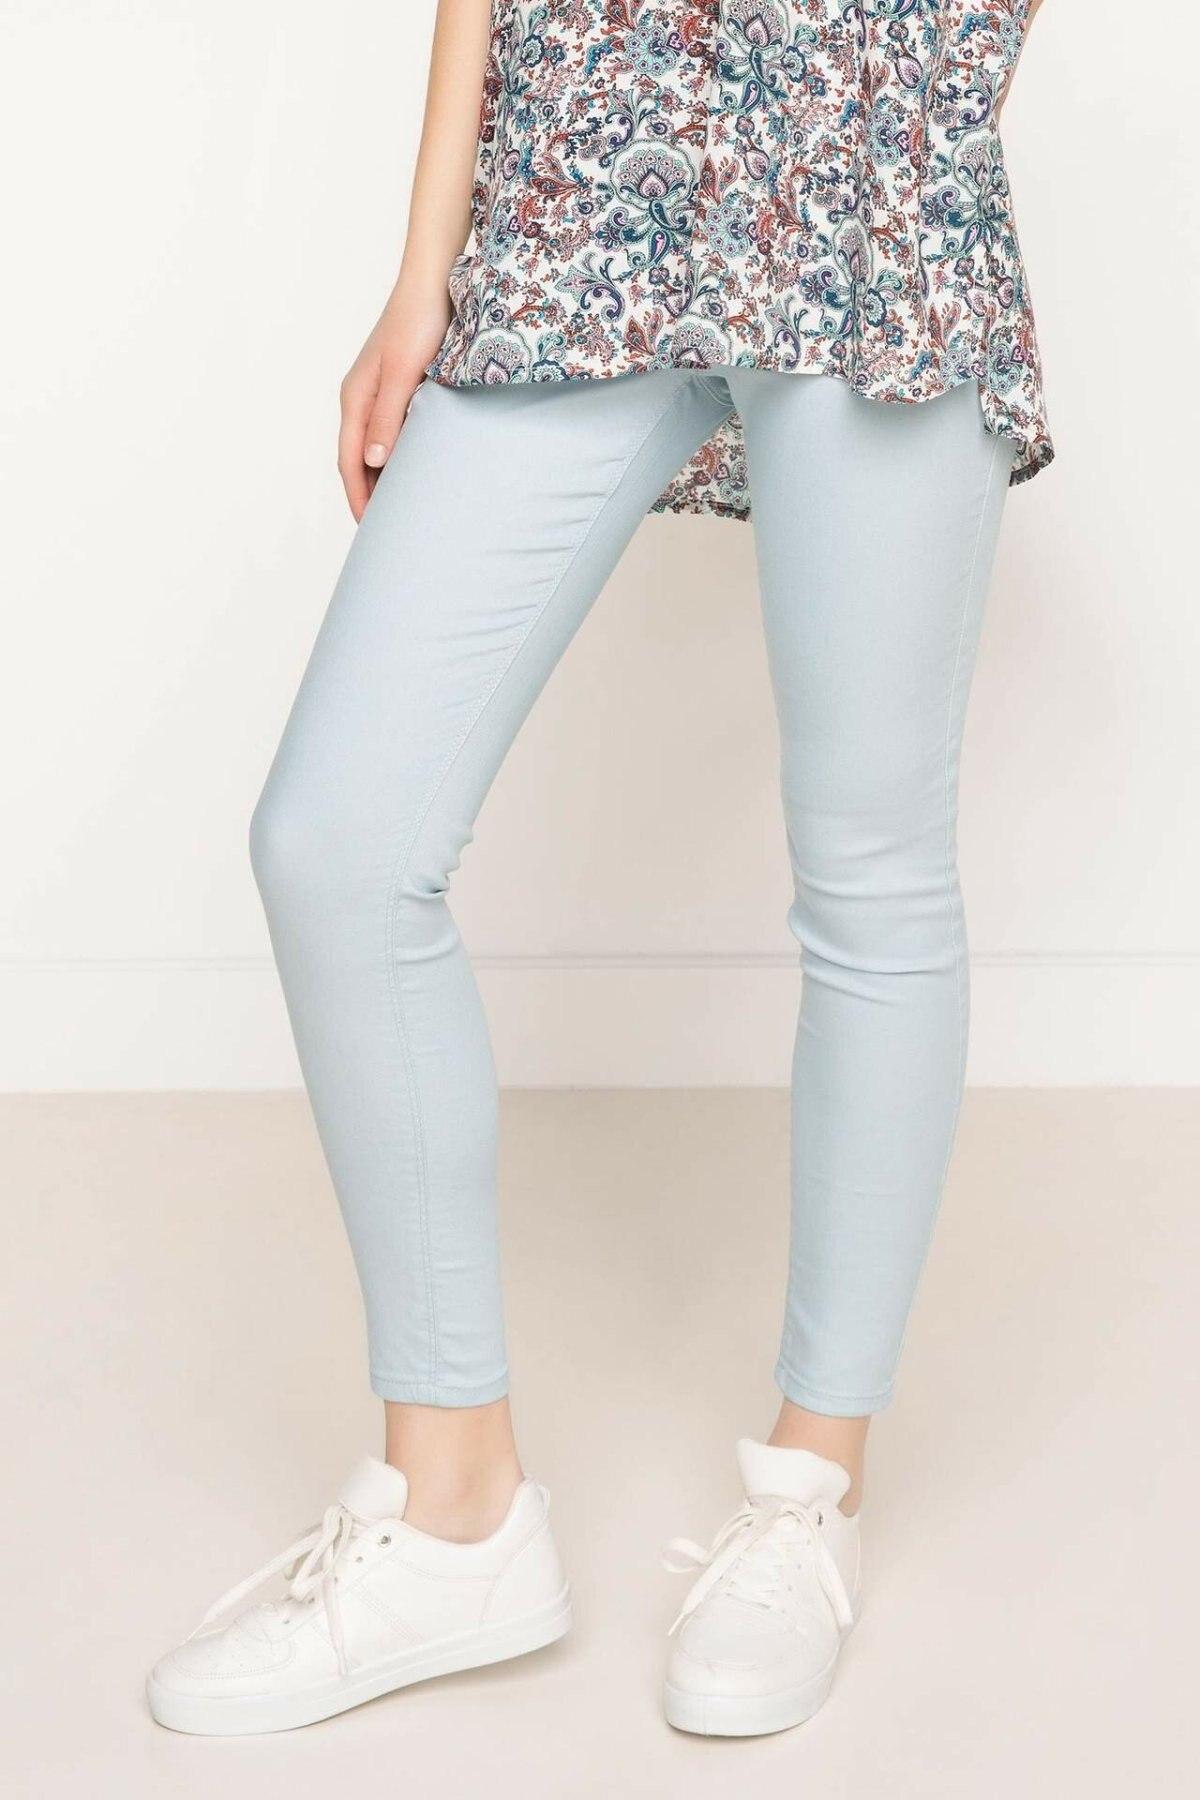 DeFacto Woman Skinny Trousers Light Blue Women Casual Pencil Pants Fit Body Women Slim Bottoms Trousers-G5963AZ17SM